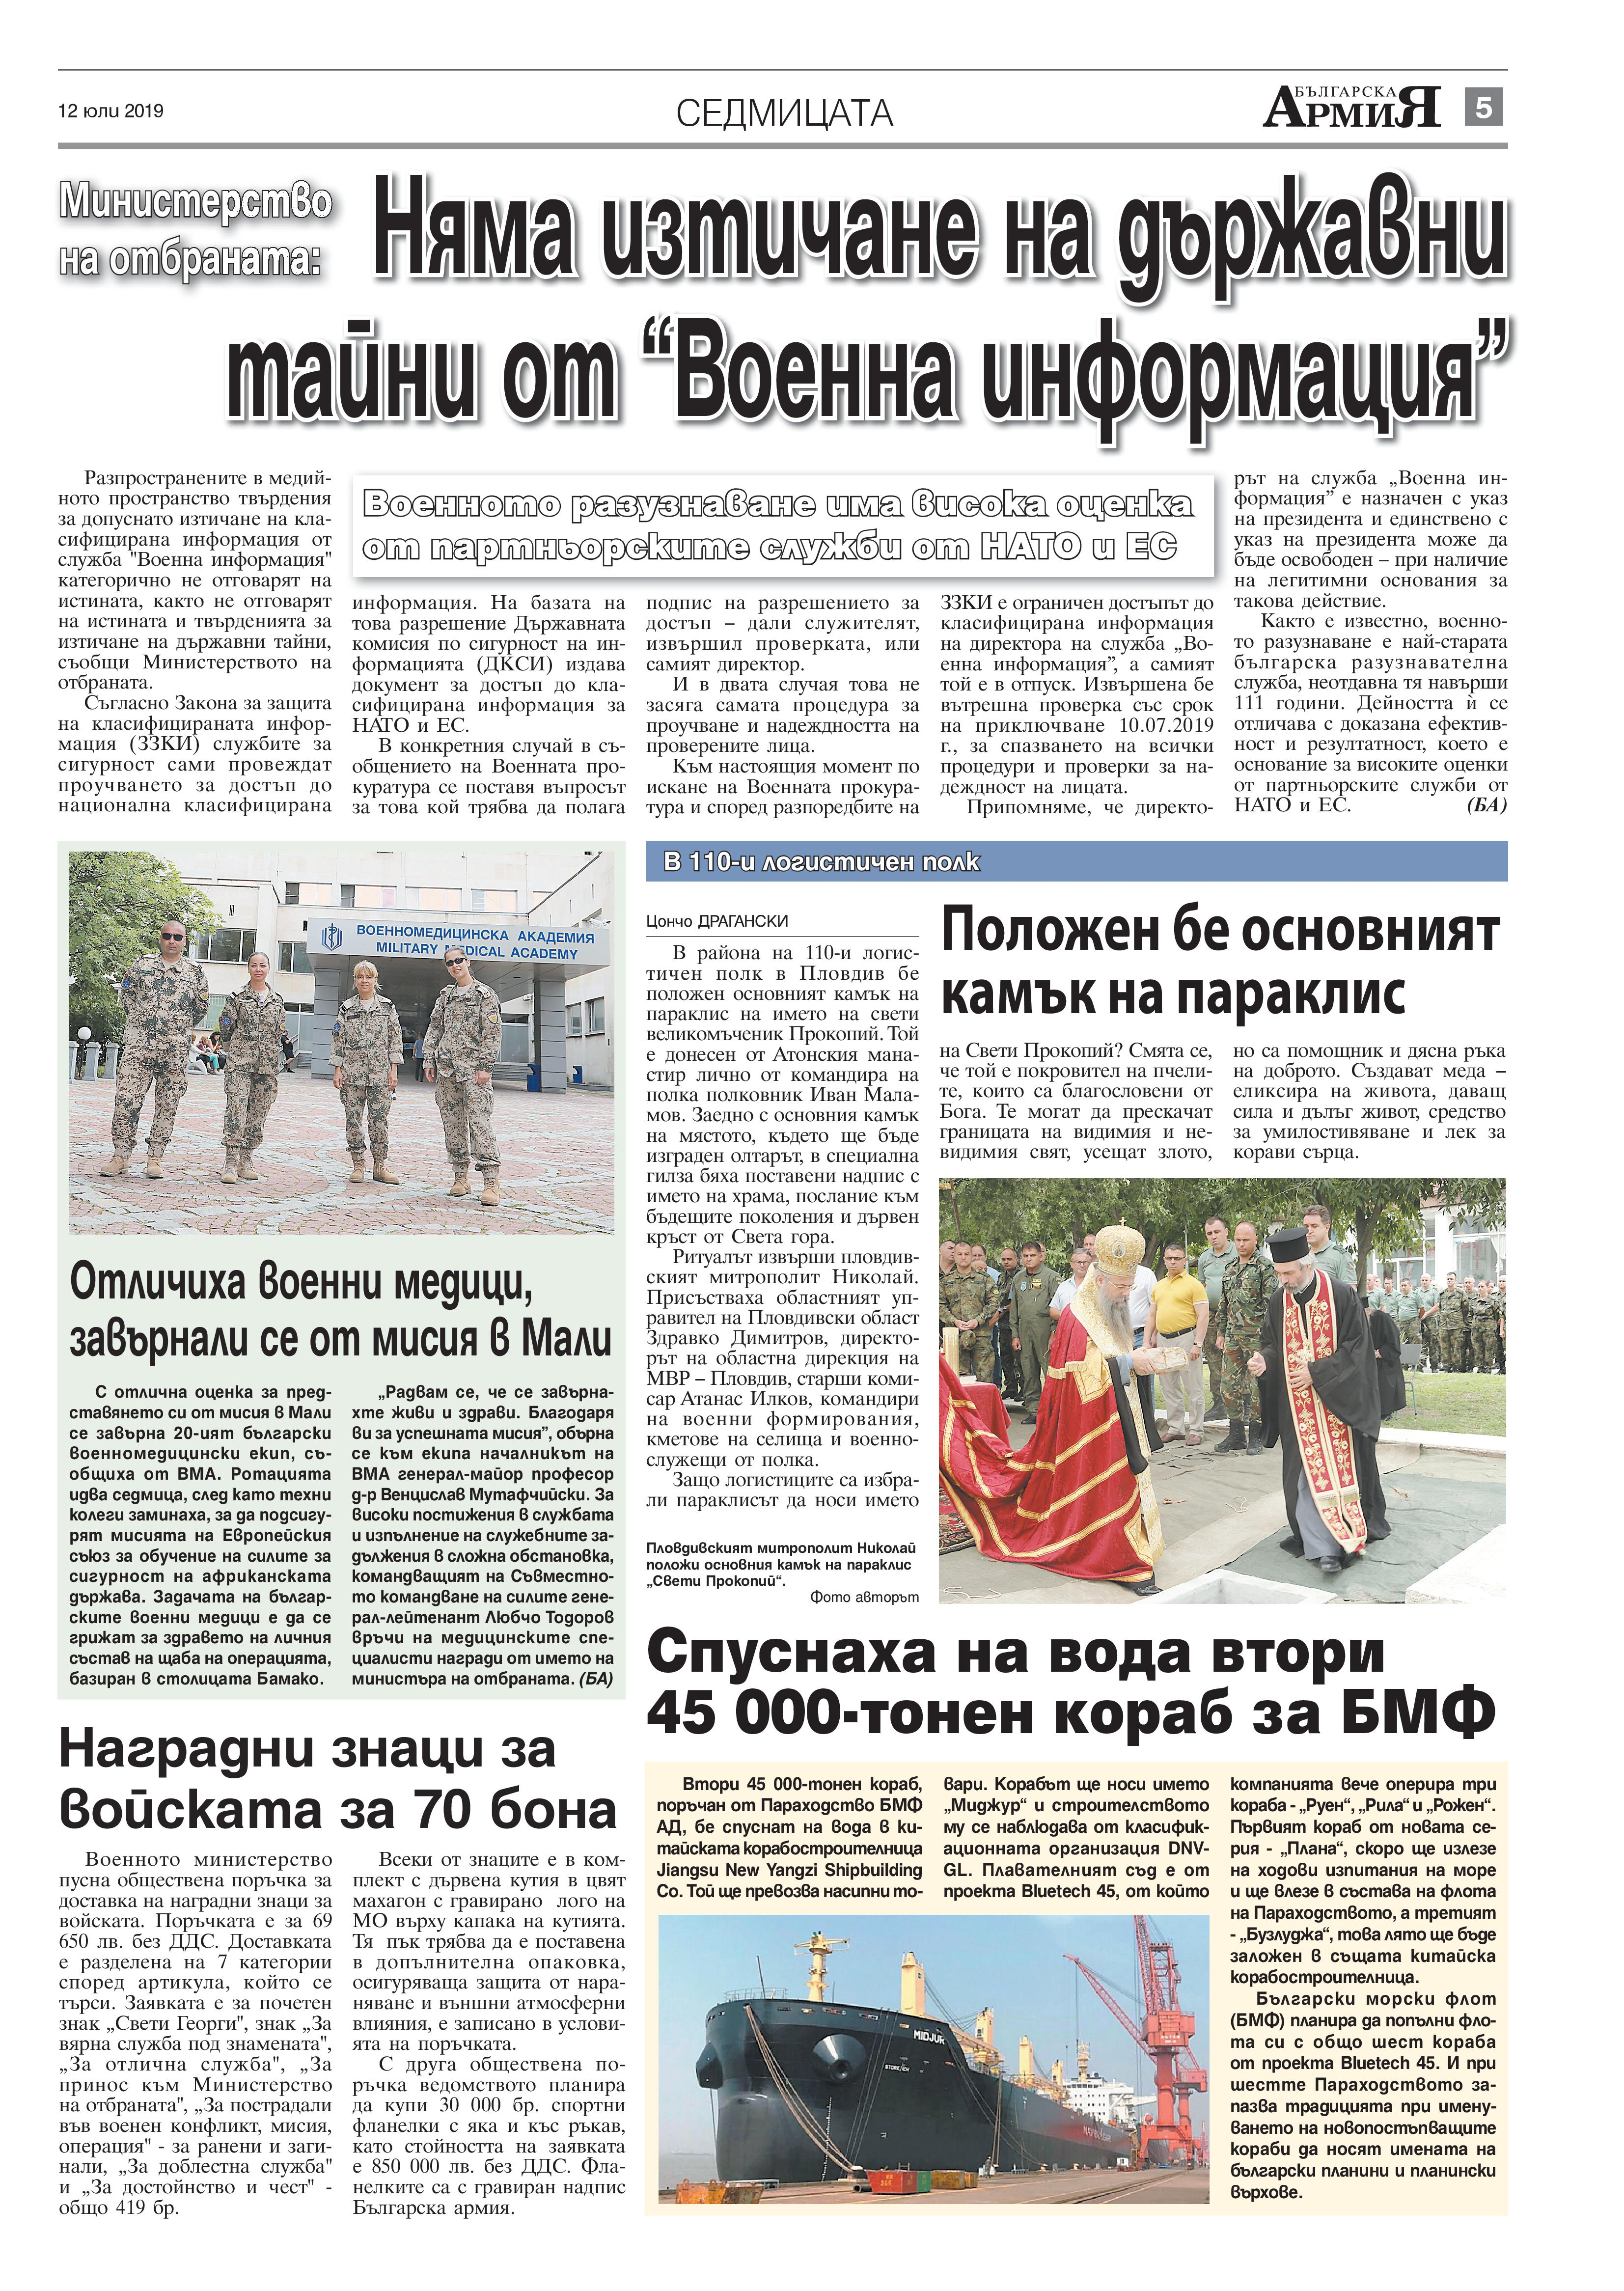 https://armymedia.bg/wp-content/uploads/2015/06/05-28.jpg